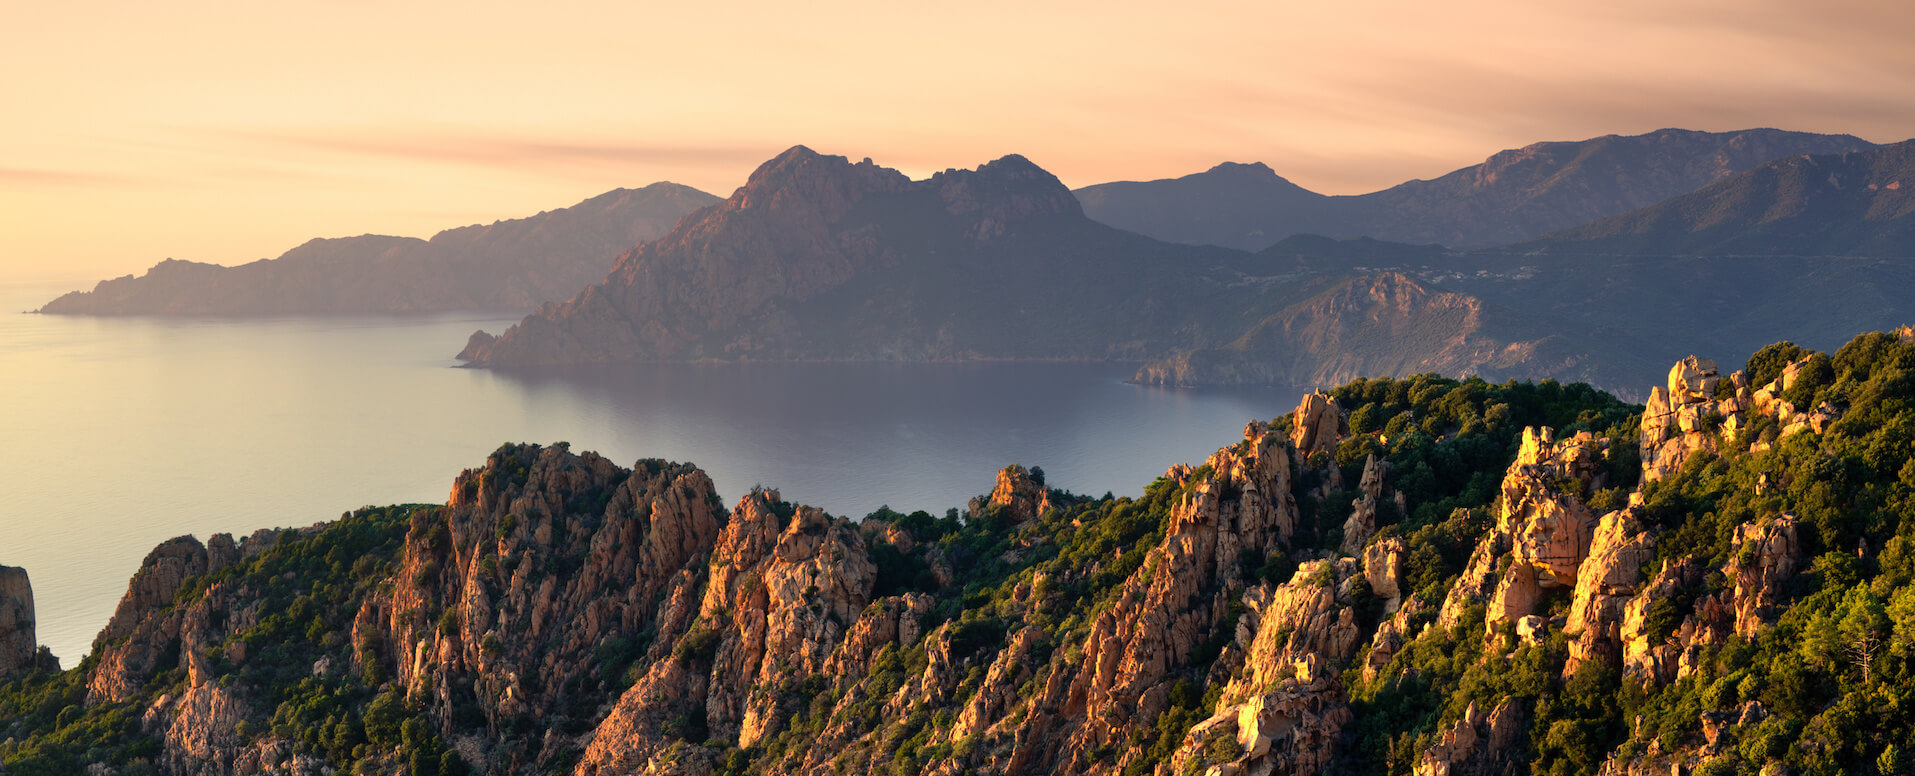 History of Corsica - Corsica